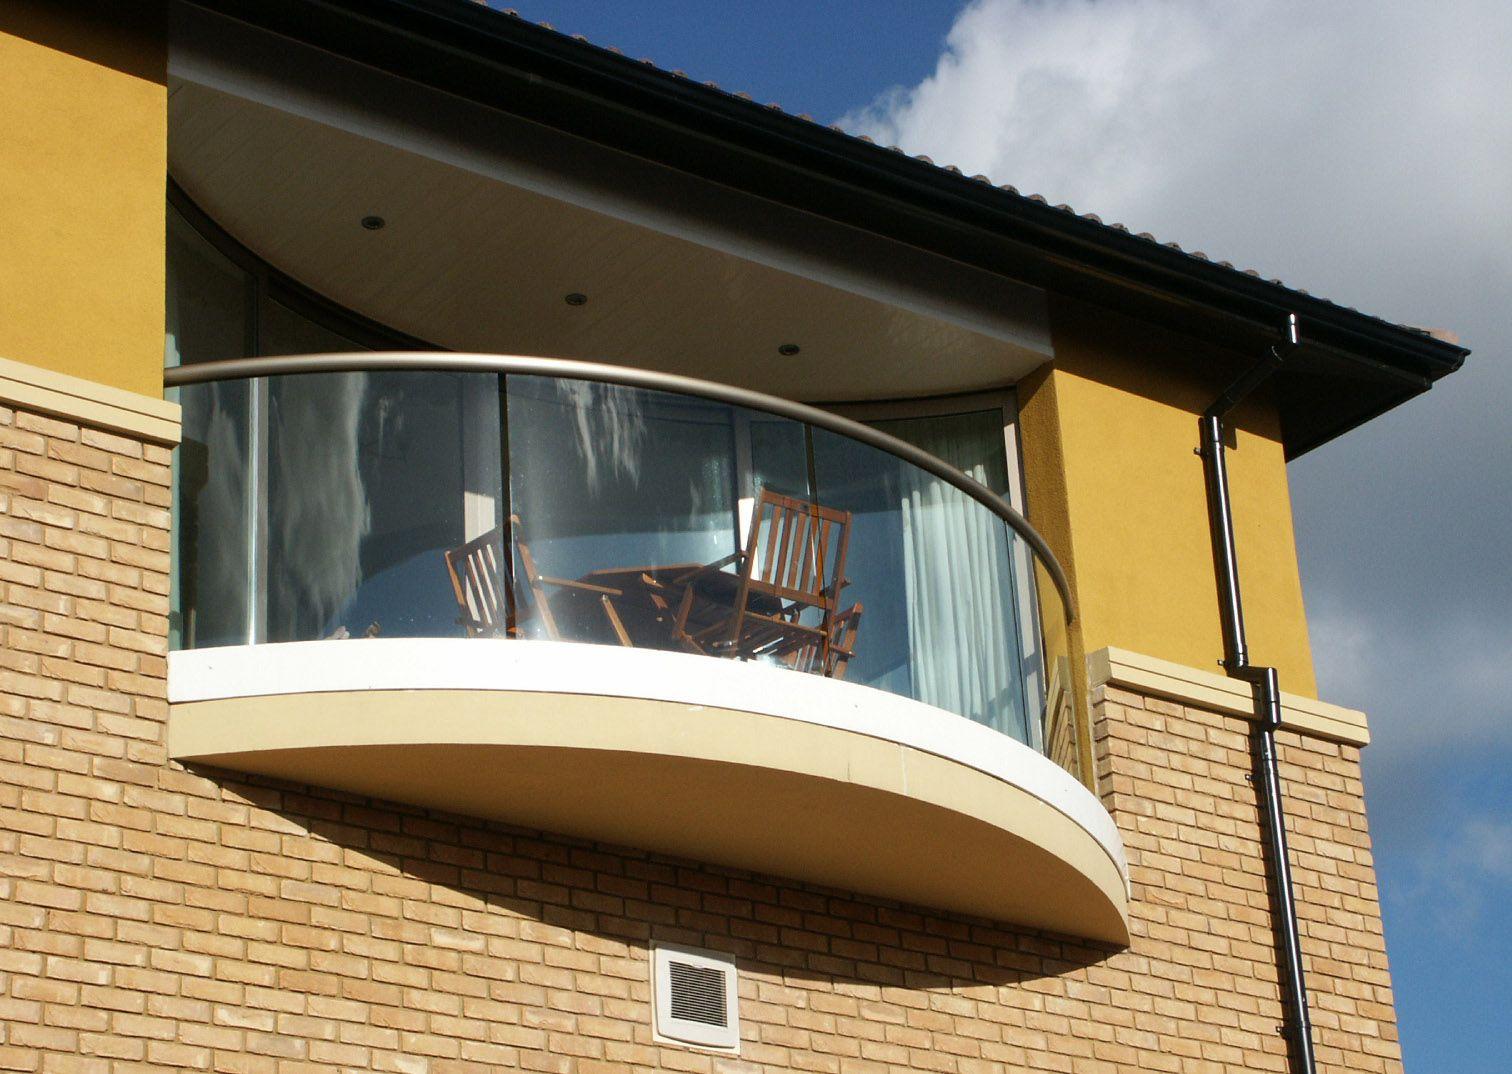 Glazing balconies do it yourself: video 86